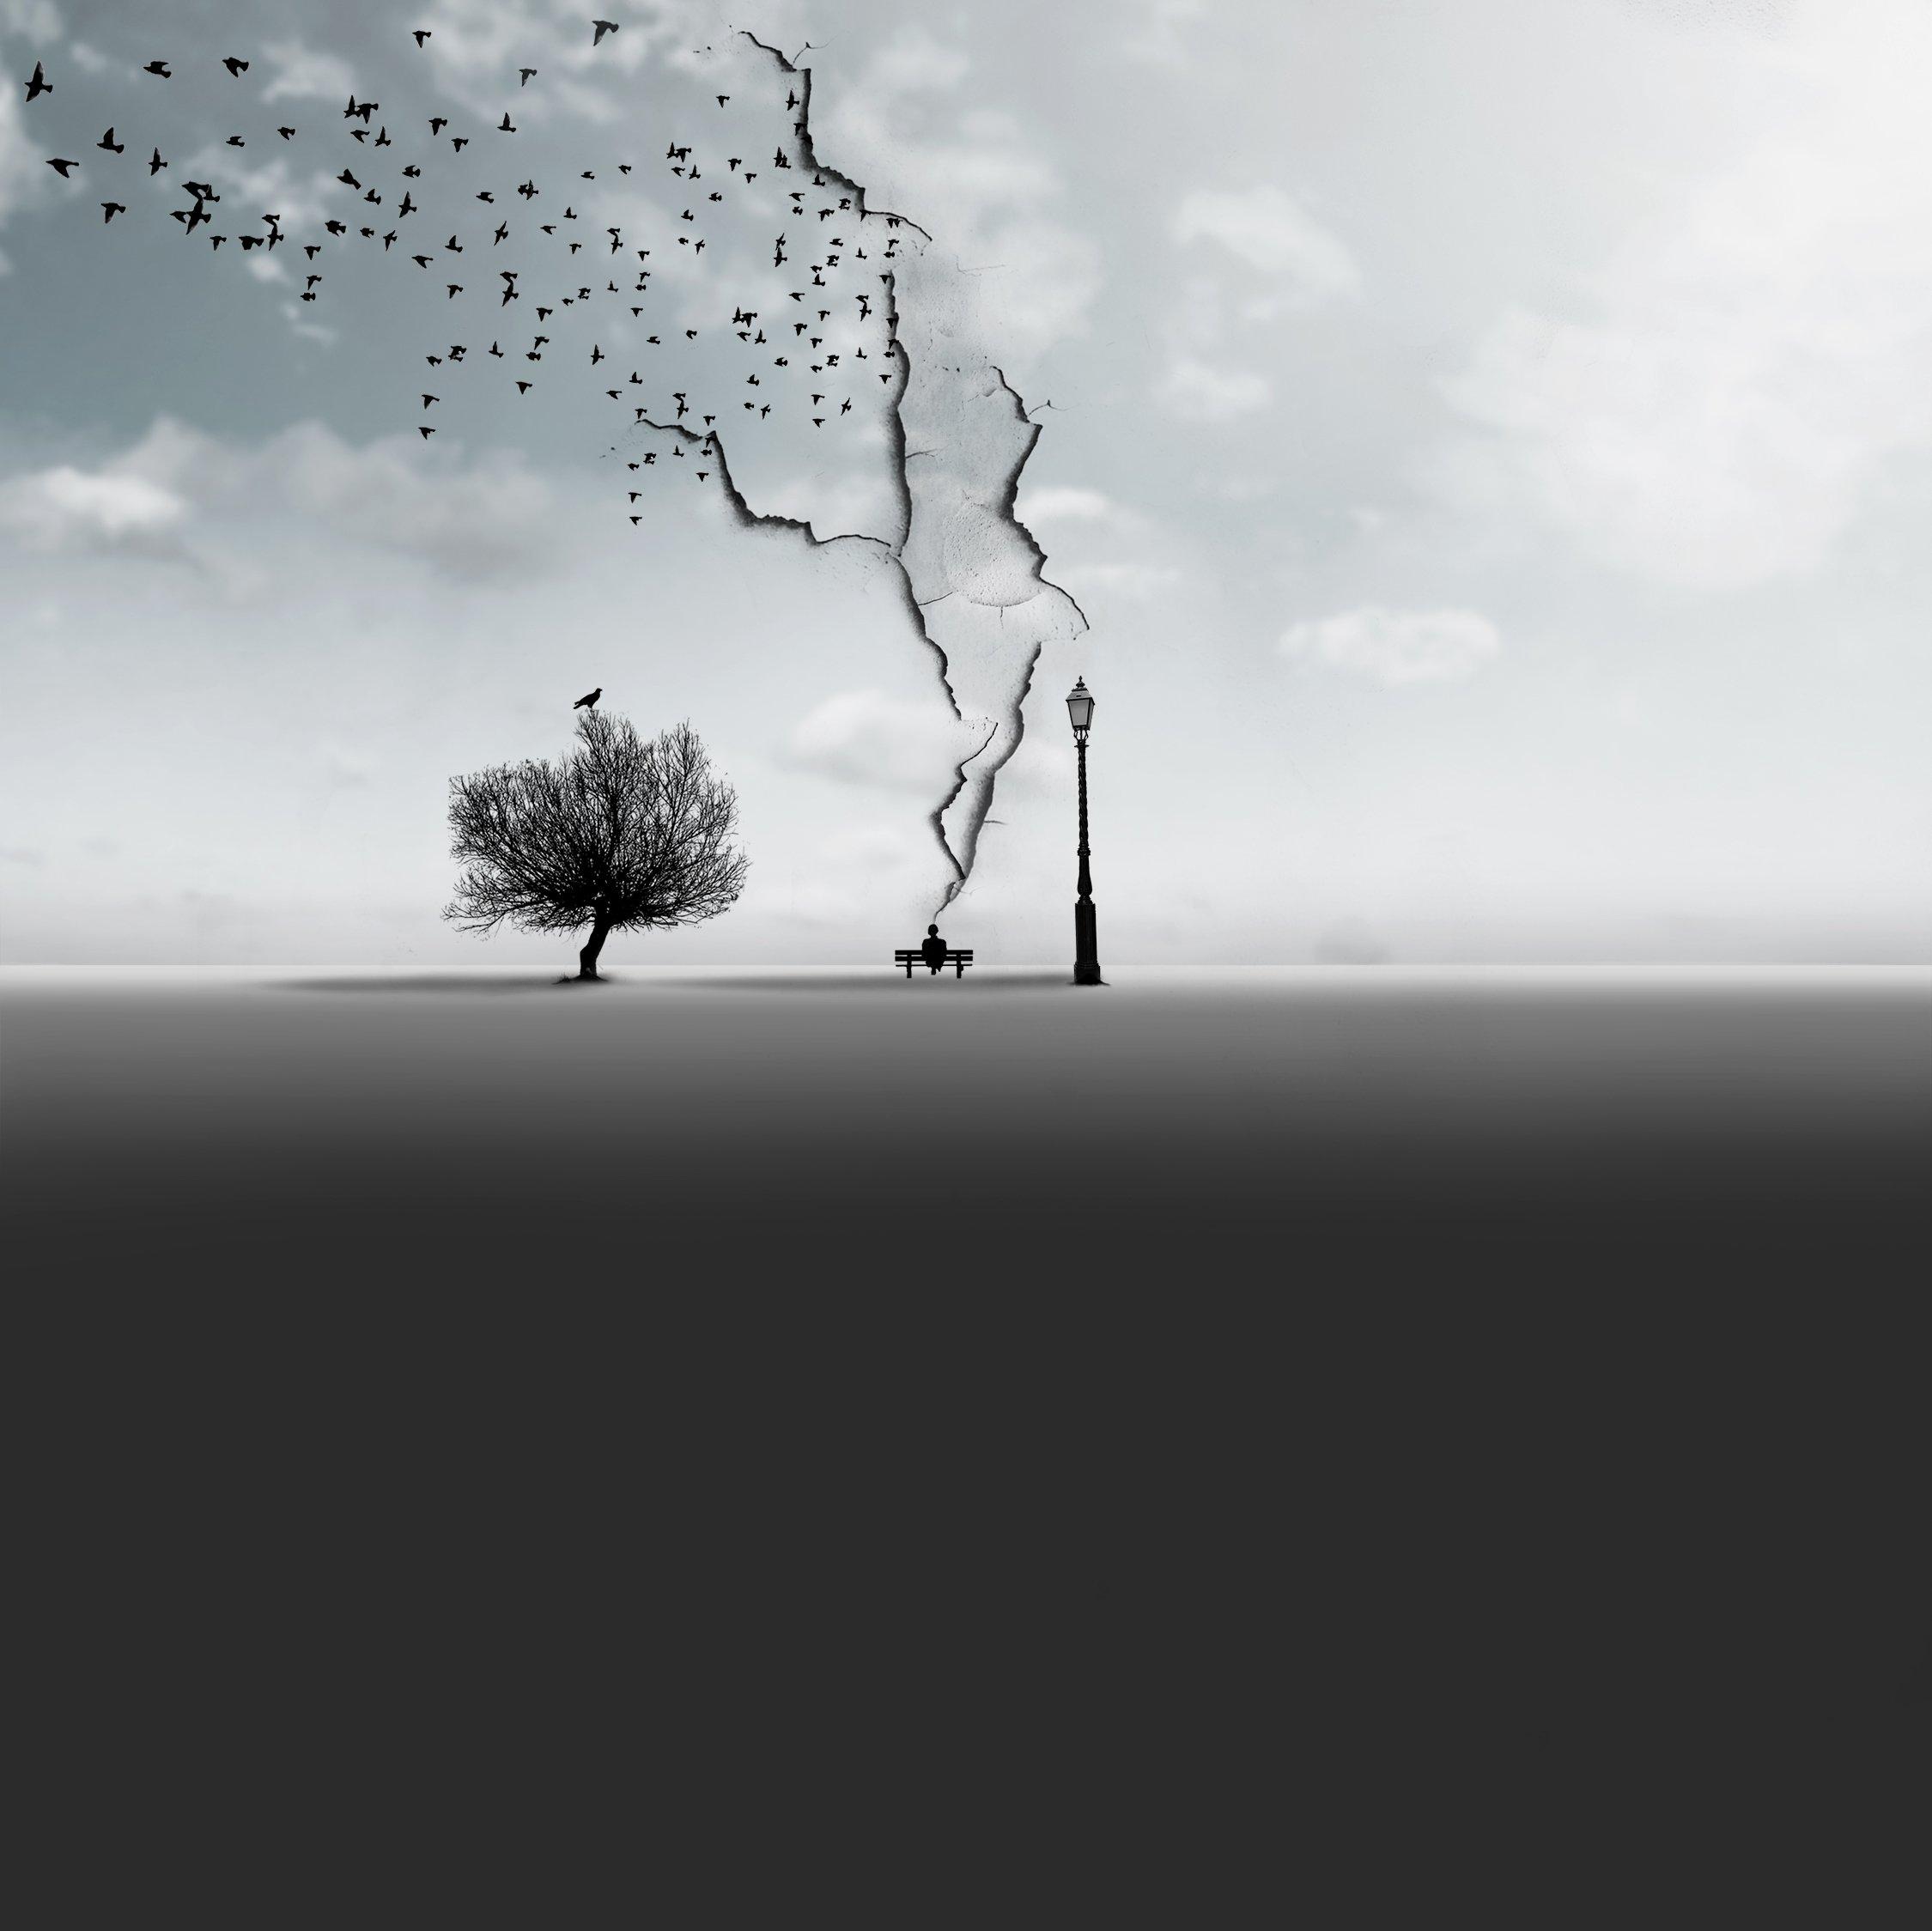 #35photo #surrealart#photoshop#ps_fantasy#art_minimal #bnw_dream #photography#minimalism#conceptual#fineart #instagram#ps_dreams#bnwminimalismmag#art_digital #ir_photographer#ir_aks#minimal#canon#blackandwhite#bnw#surreal#hadimalijani#art#fantastic_earth#, Hadi Malijani